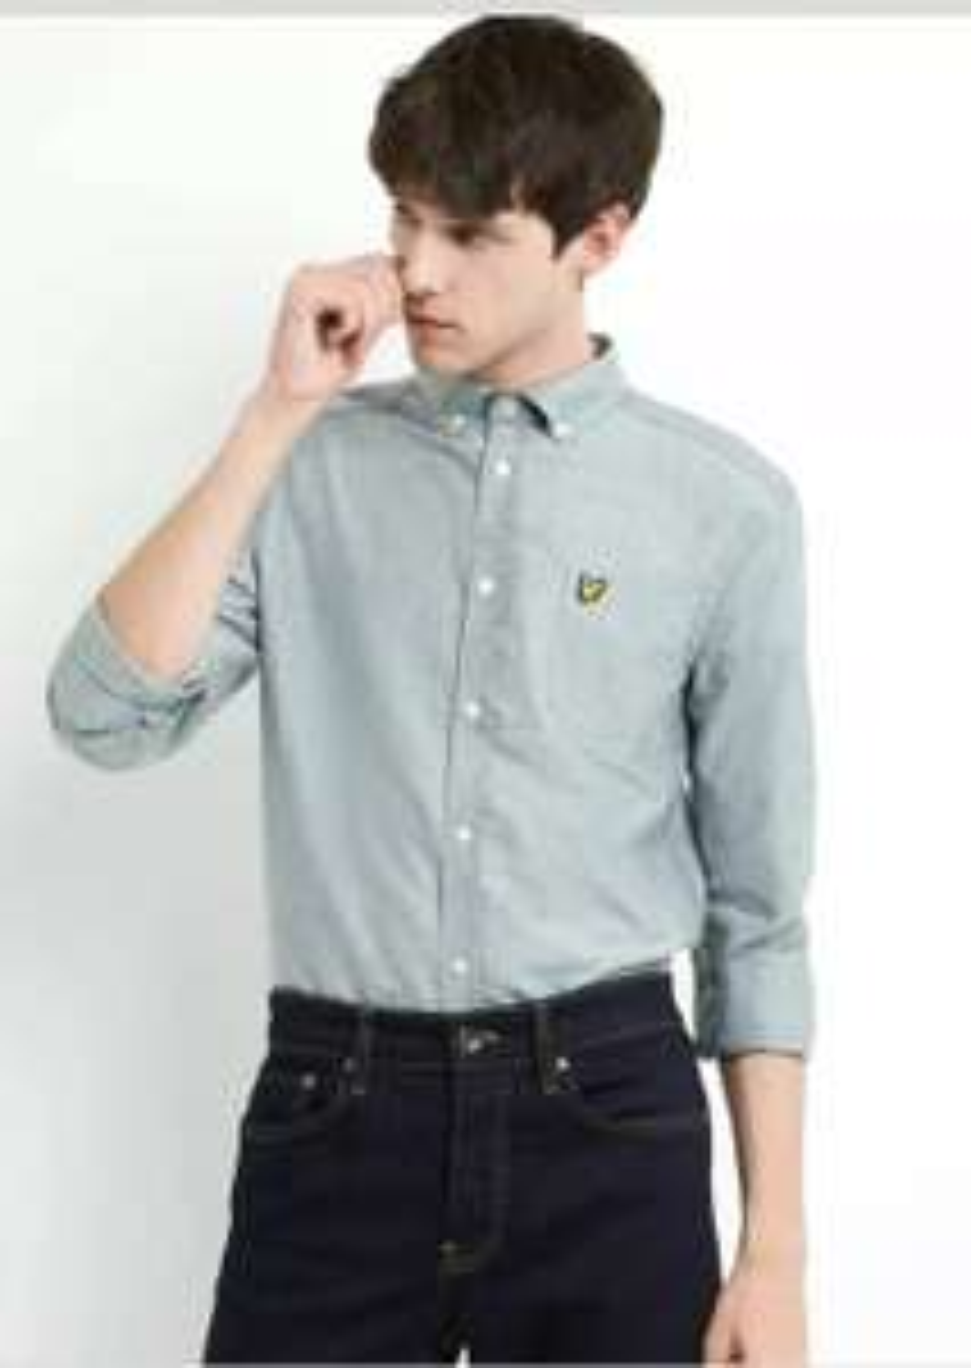 Lyle and Scott Men Oxford Shirt - Cotton - £20.63 @ lyleandscott eBay